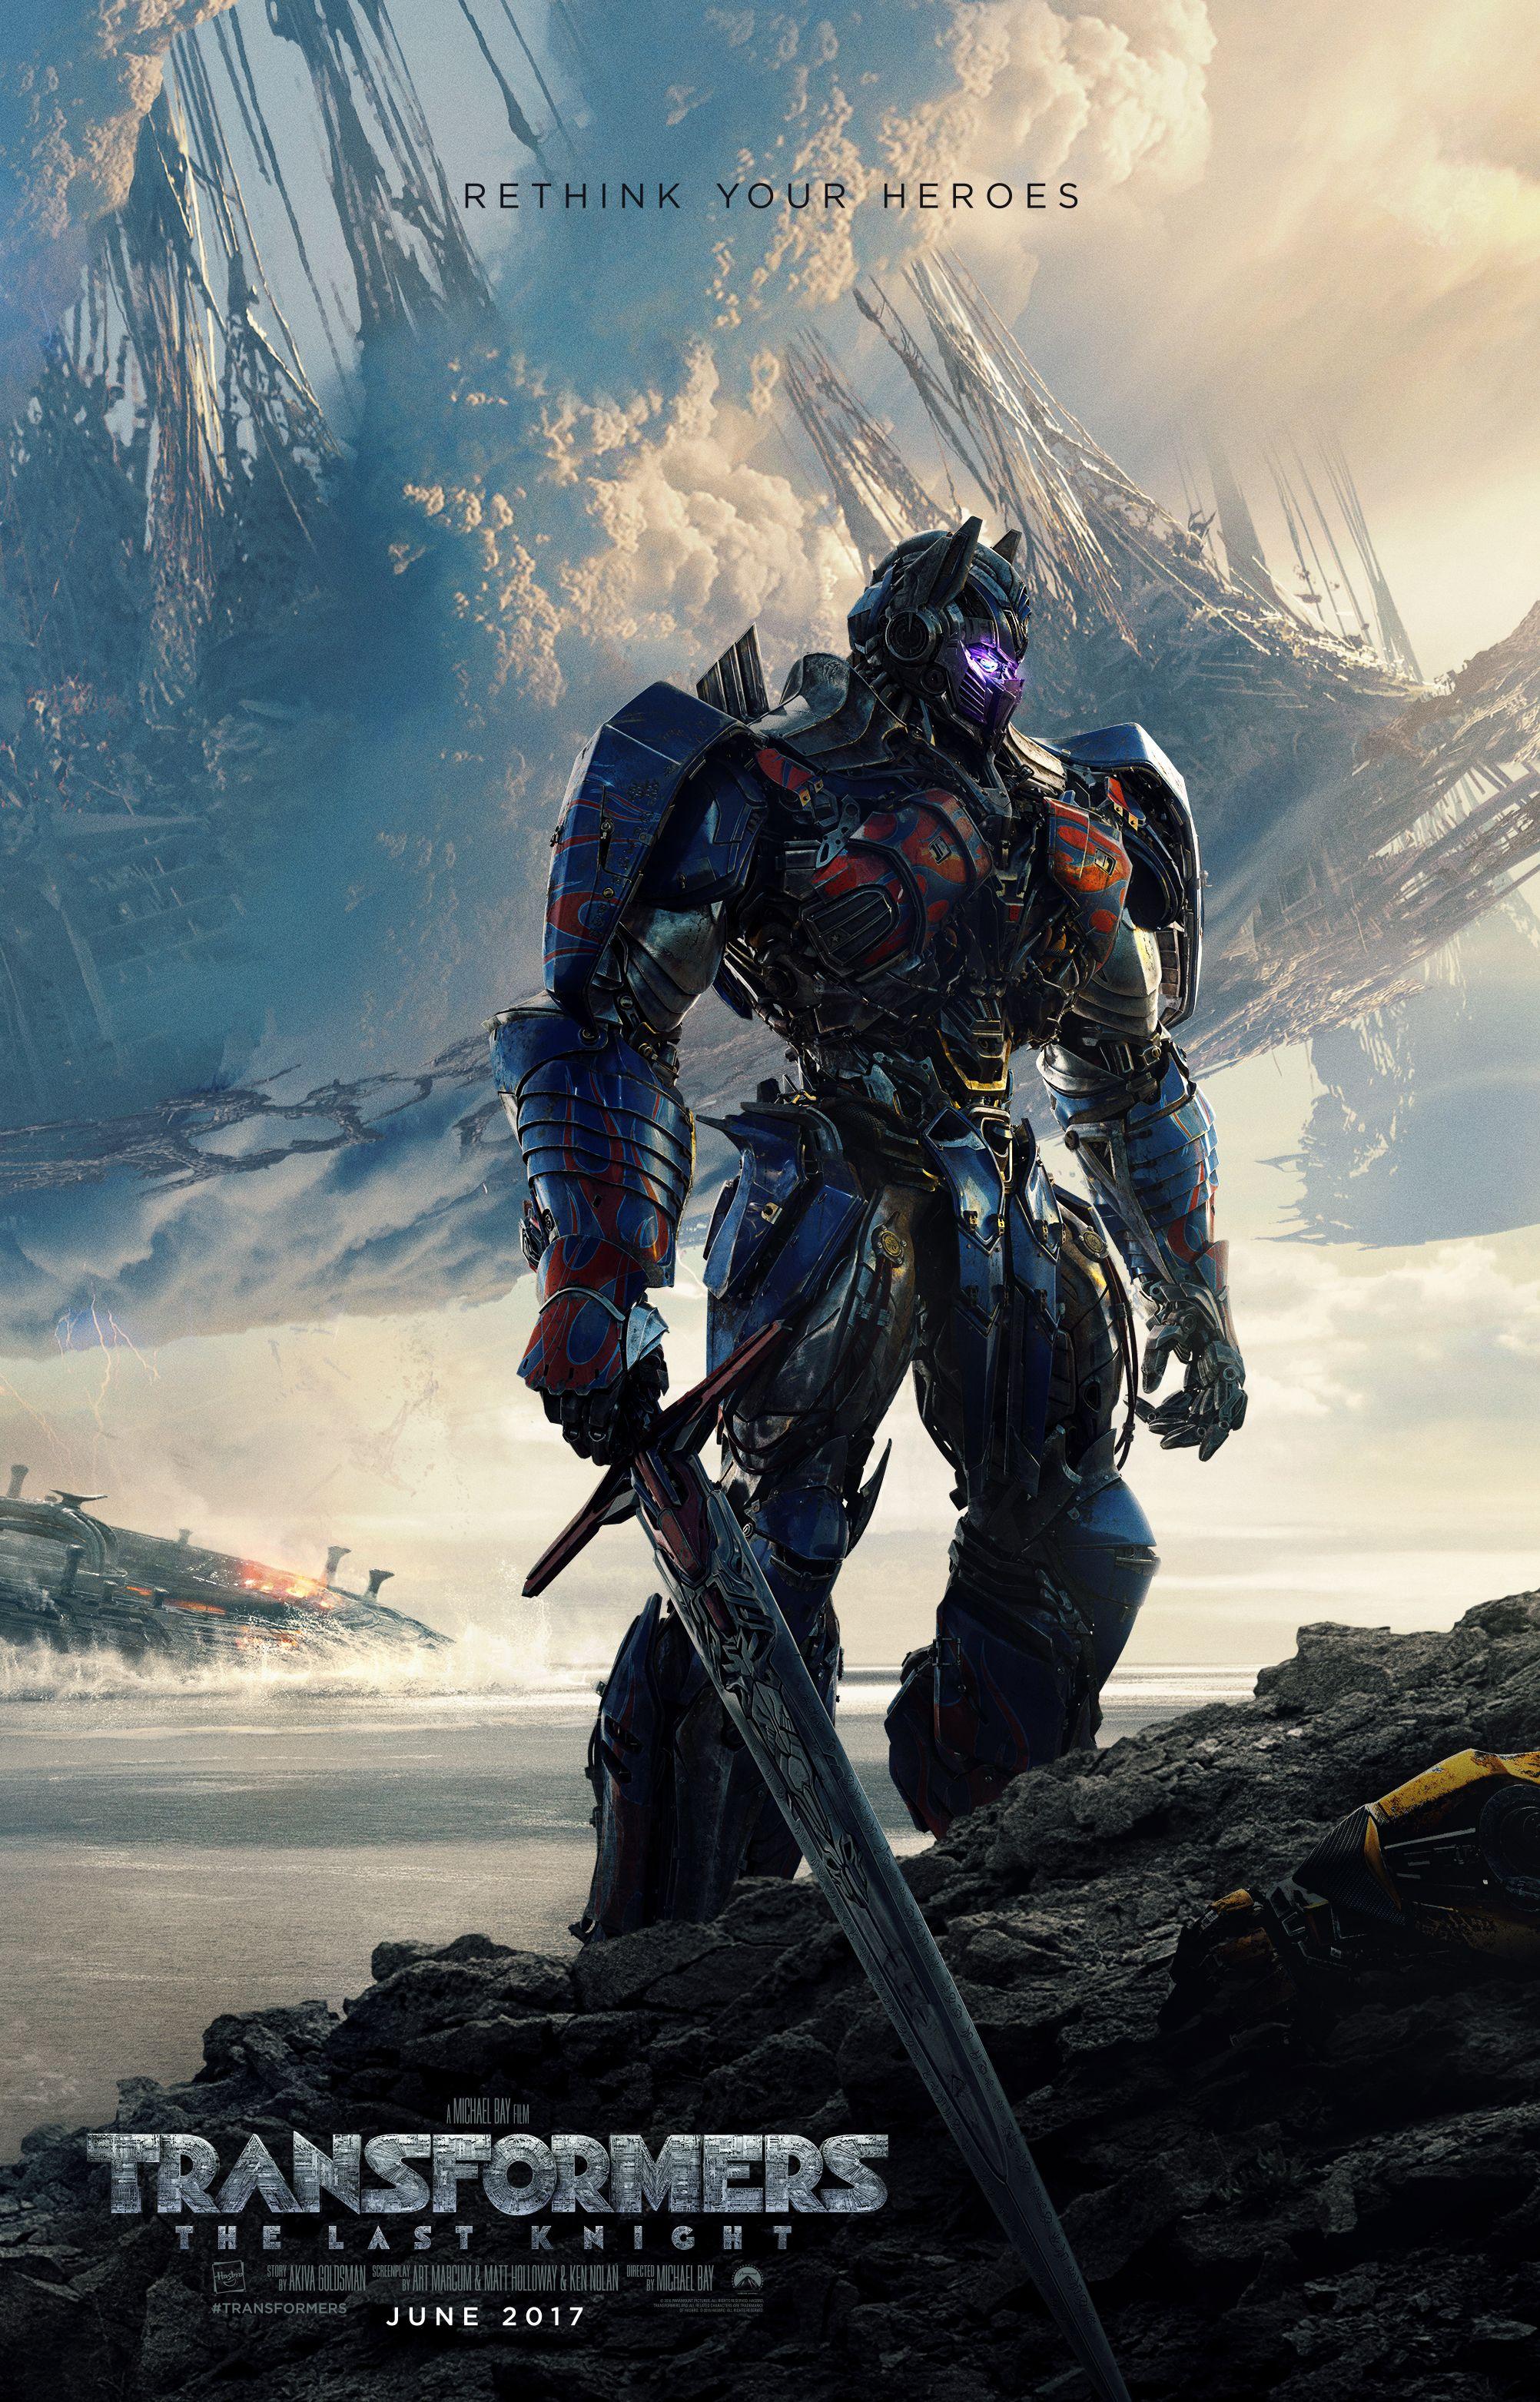 Unicron Transformers Movie